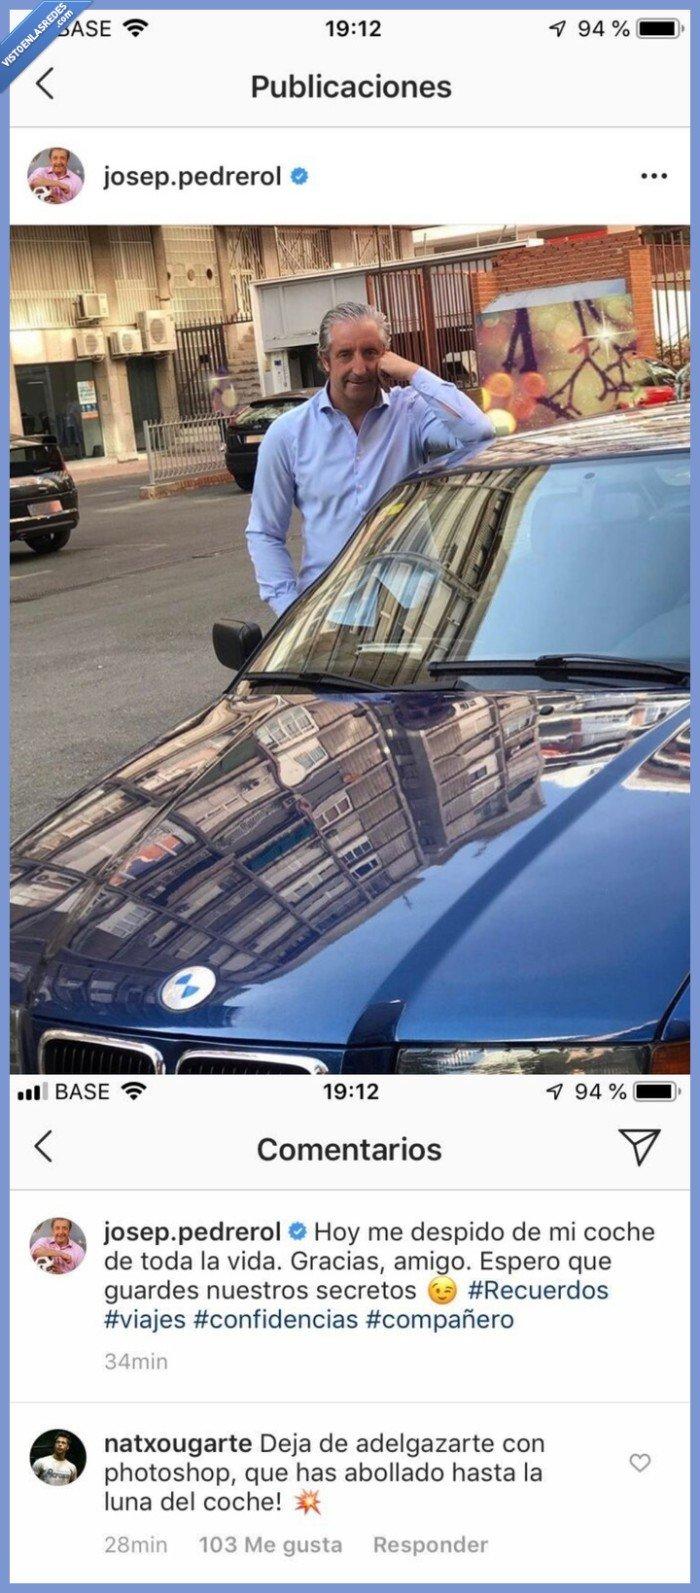 coche,pedrerol,photoshop